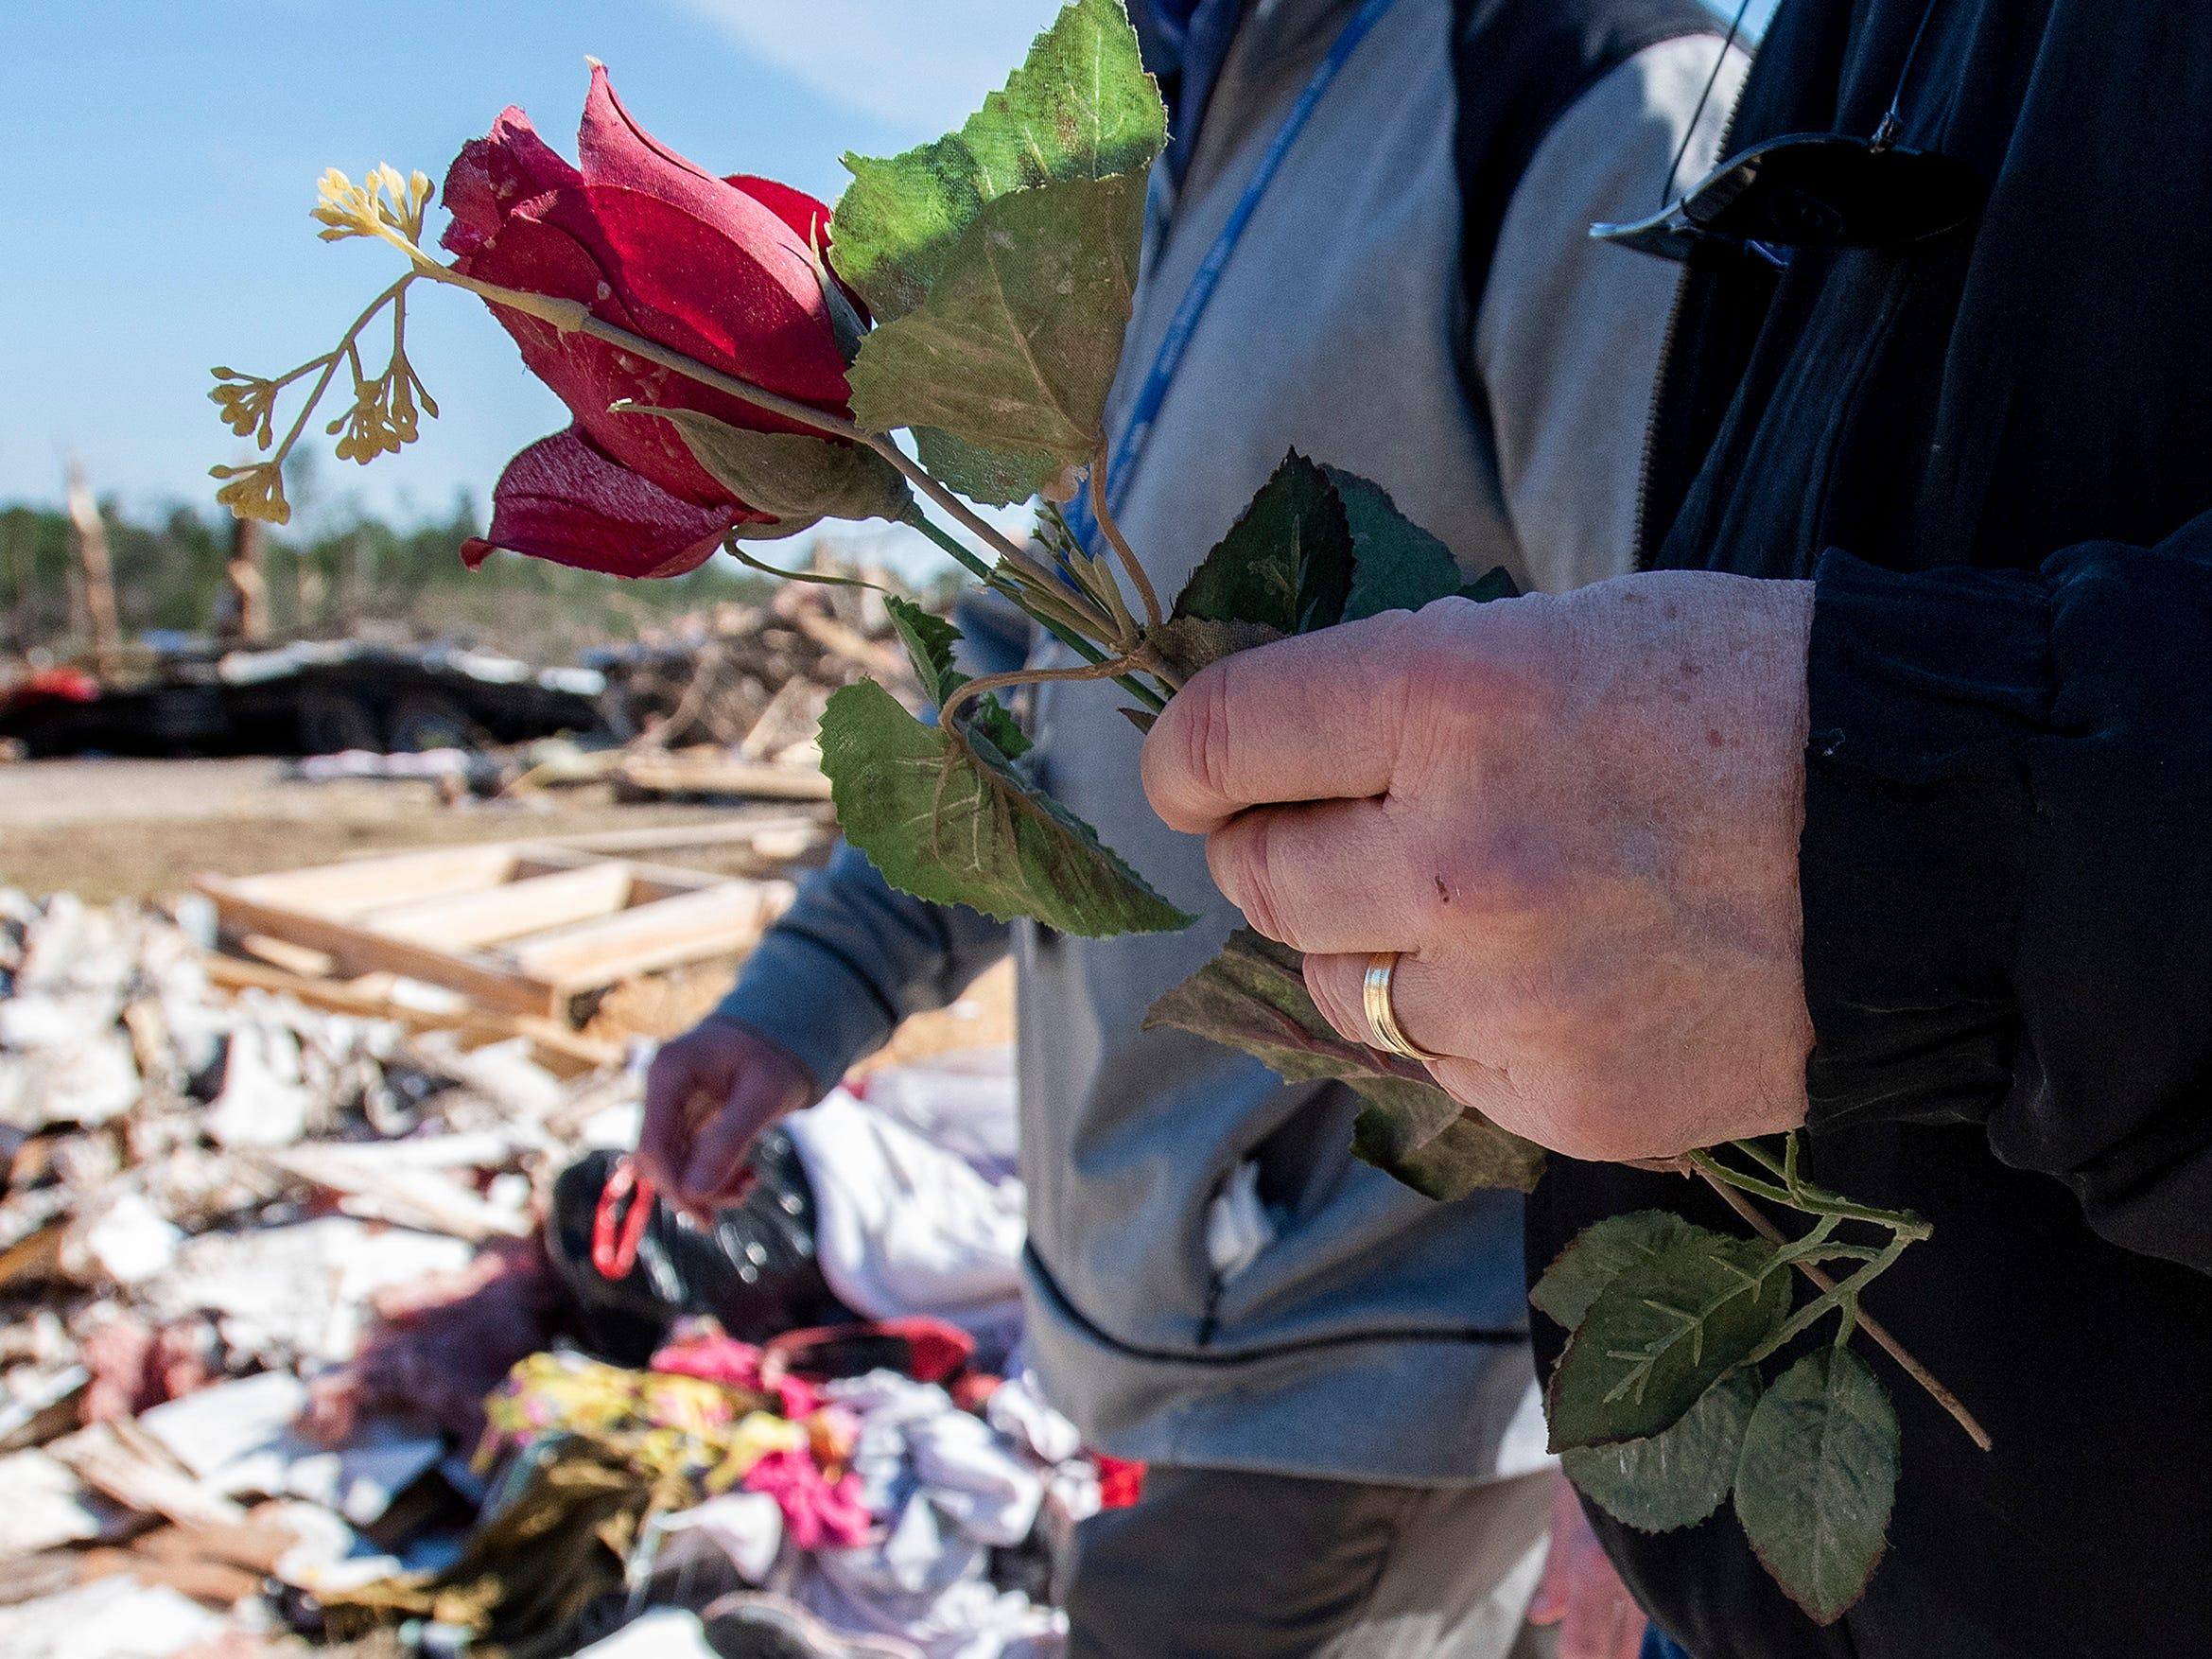 Sen. Doug Jones, D-Ala., carries a plastic rose he picked up among the debris in Beauregard, Ala., on March 7, 2019.